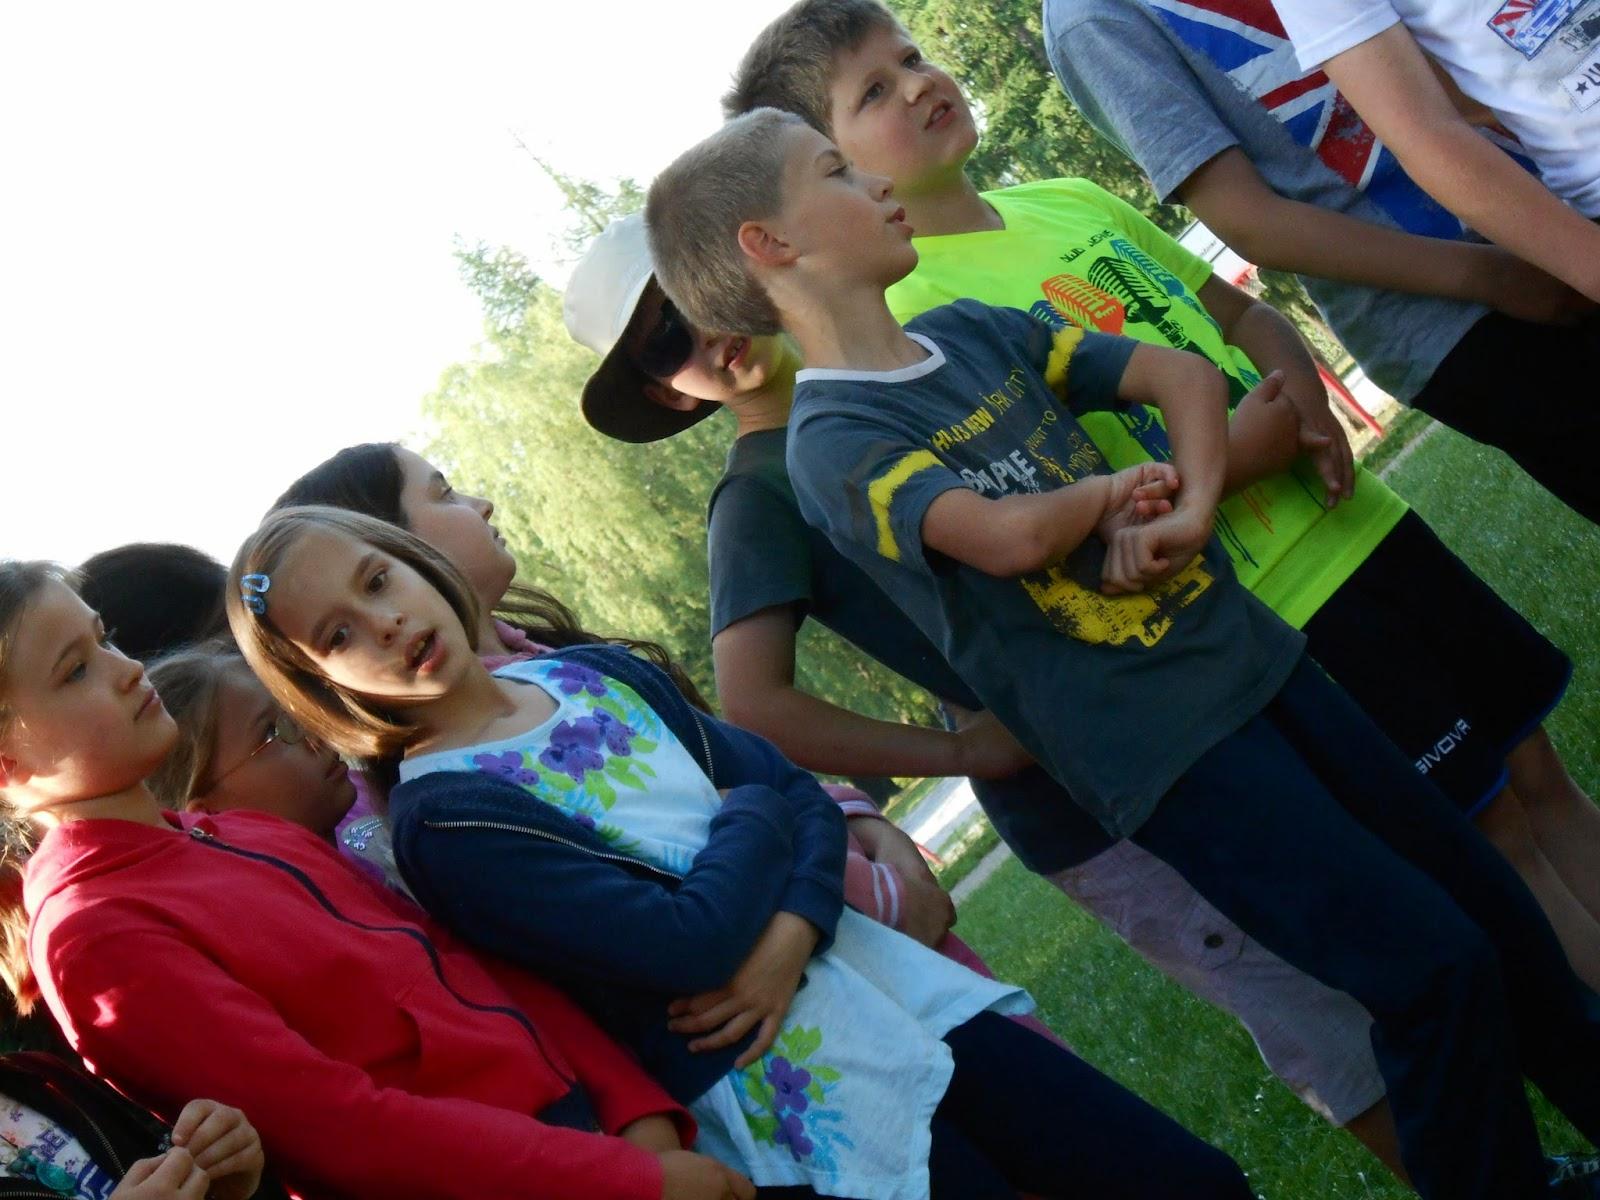 Športni dan 4. a in 4. b, Ilirska Bistrica, 19. 5. 2015 - DSCN4623.JPG